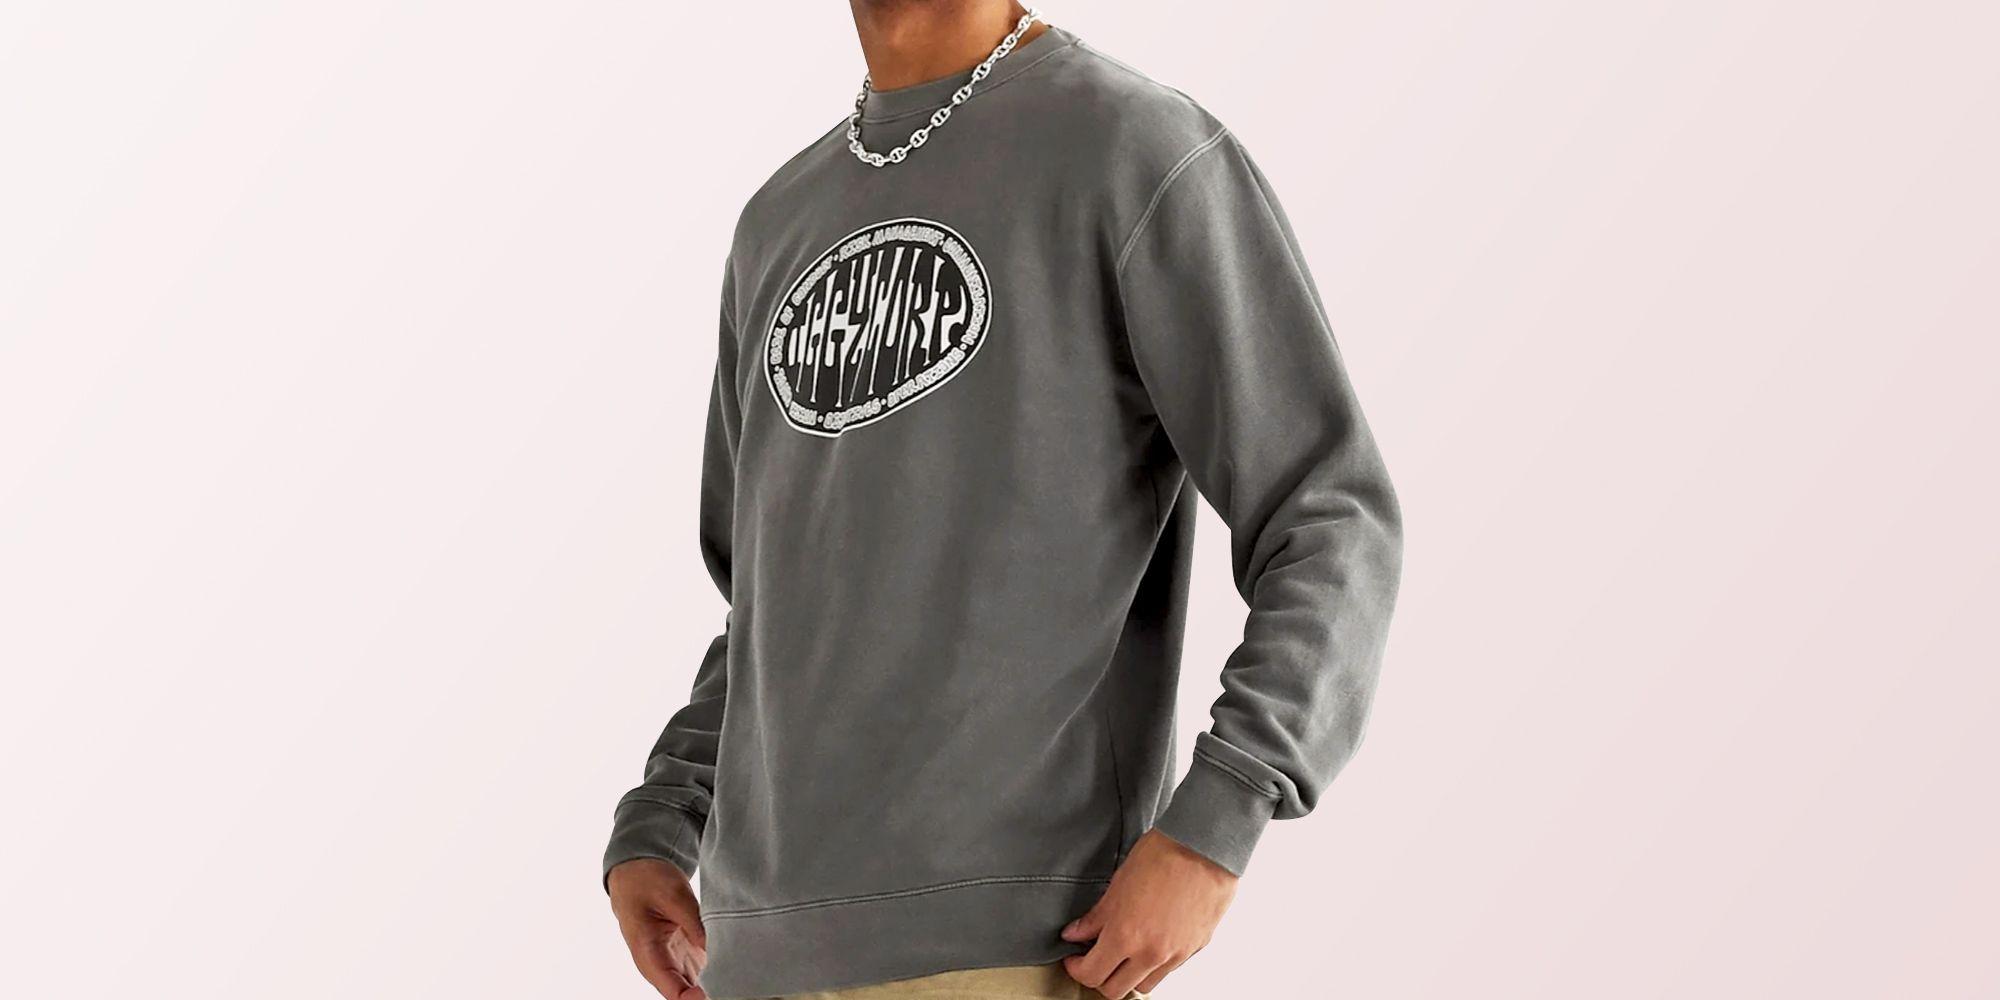 A Great Crewneck Sweatshirt Is the Most Versatile Item in Your WFH Wardrobe